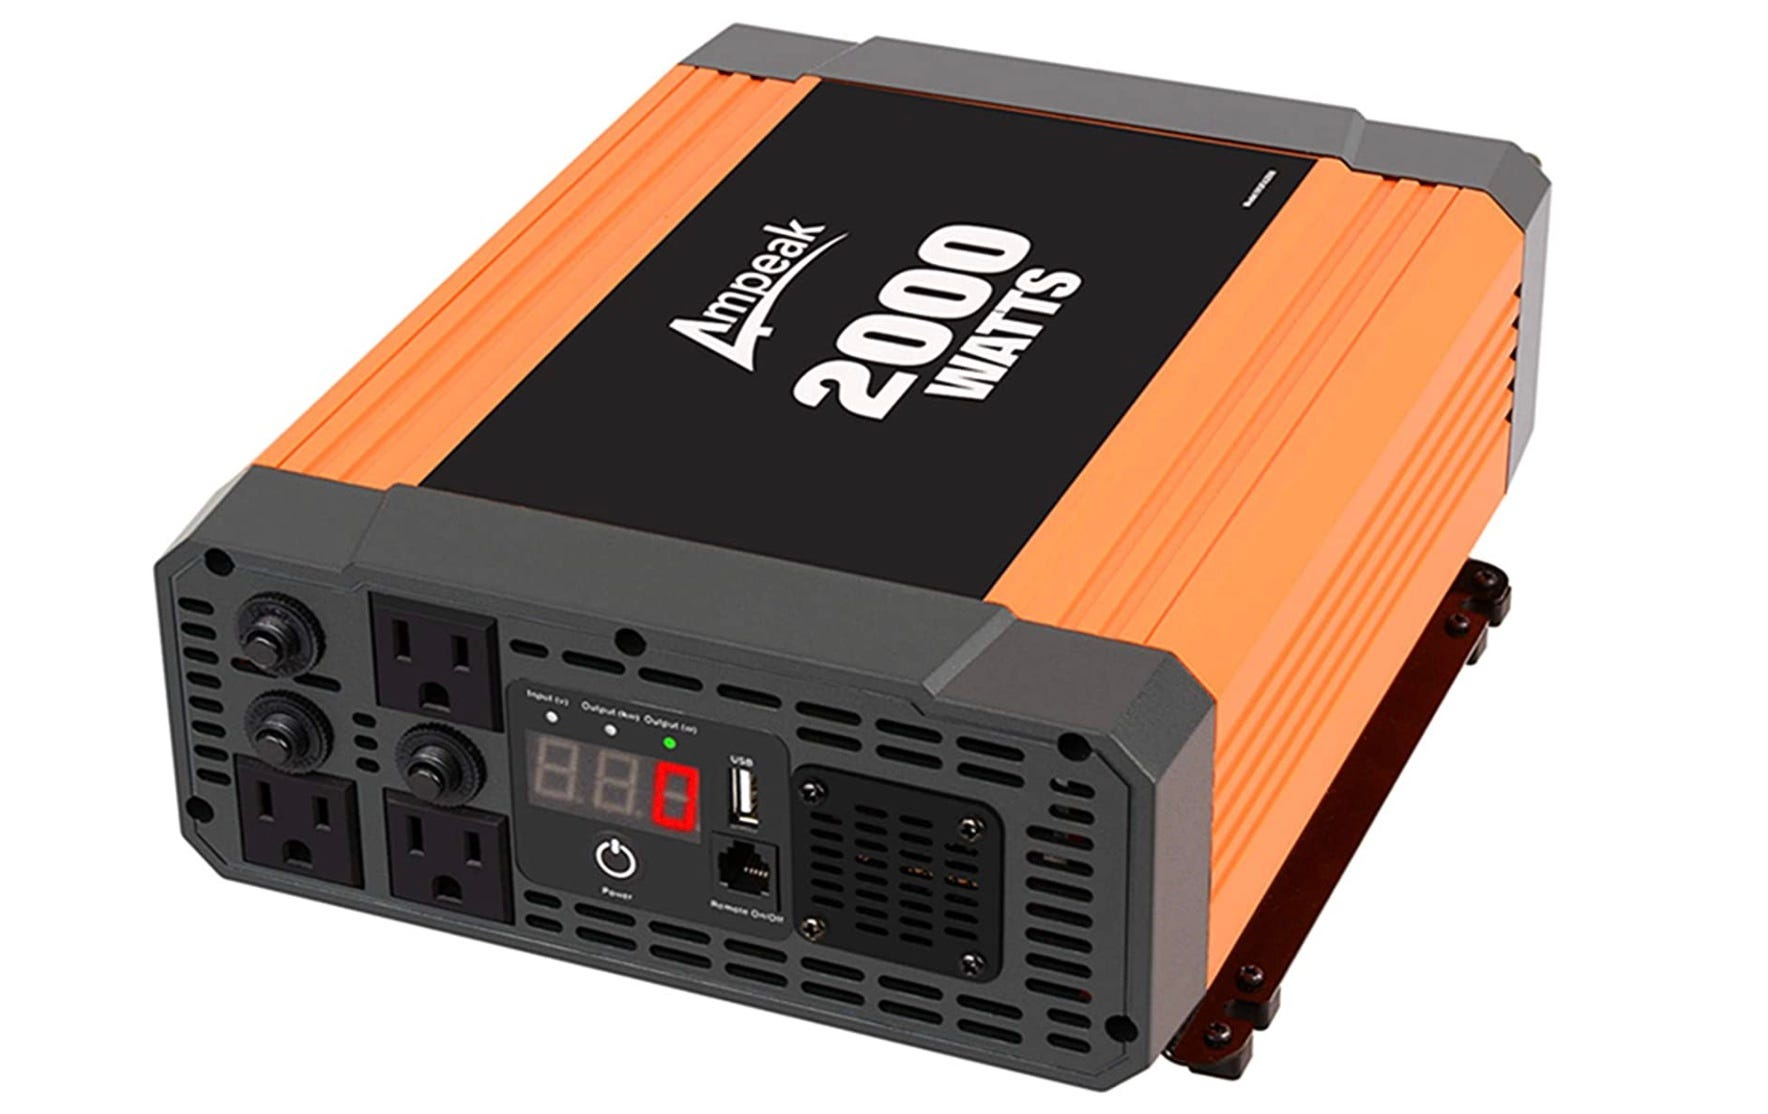 Ampeak Power Inverter